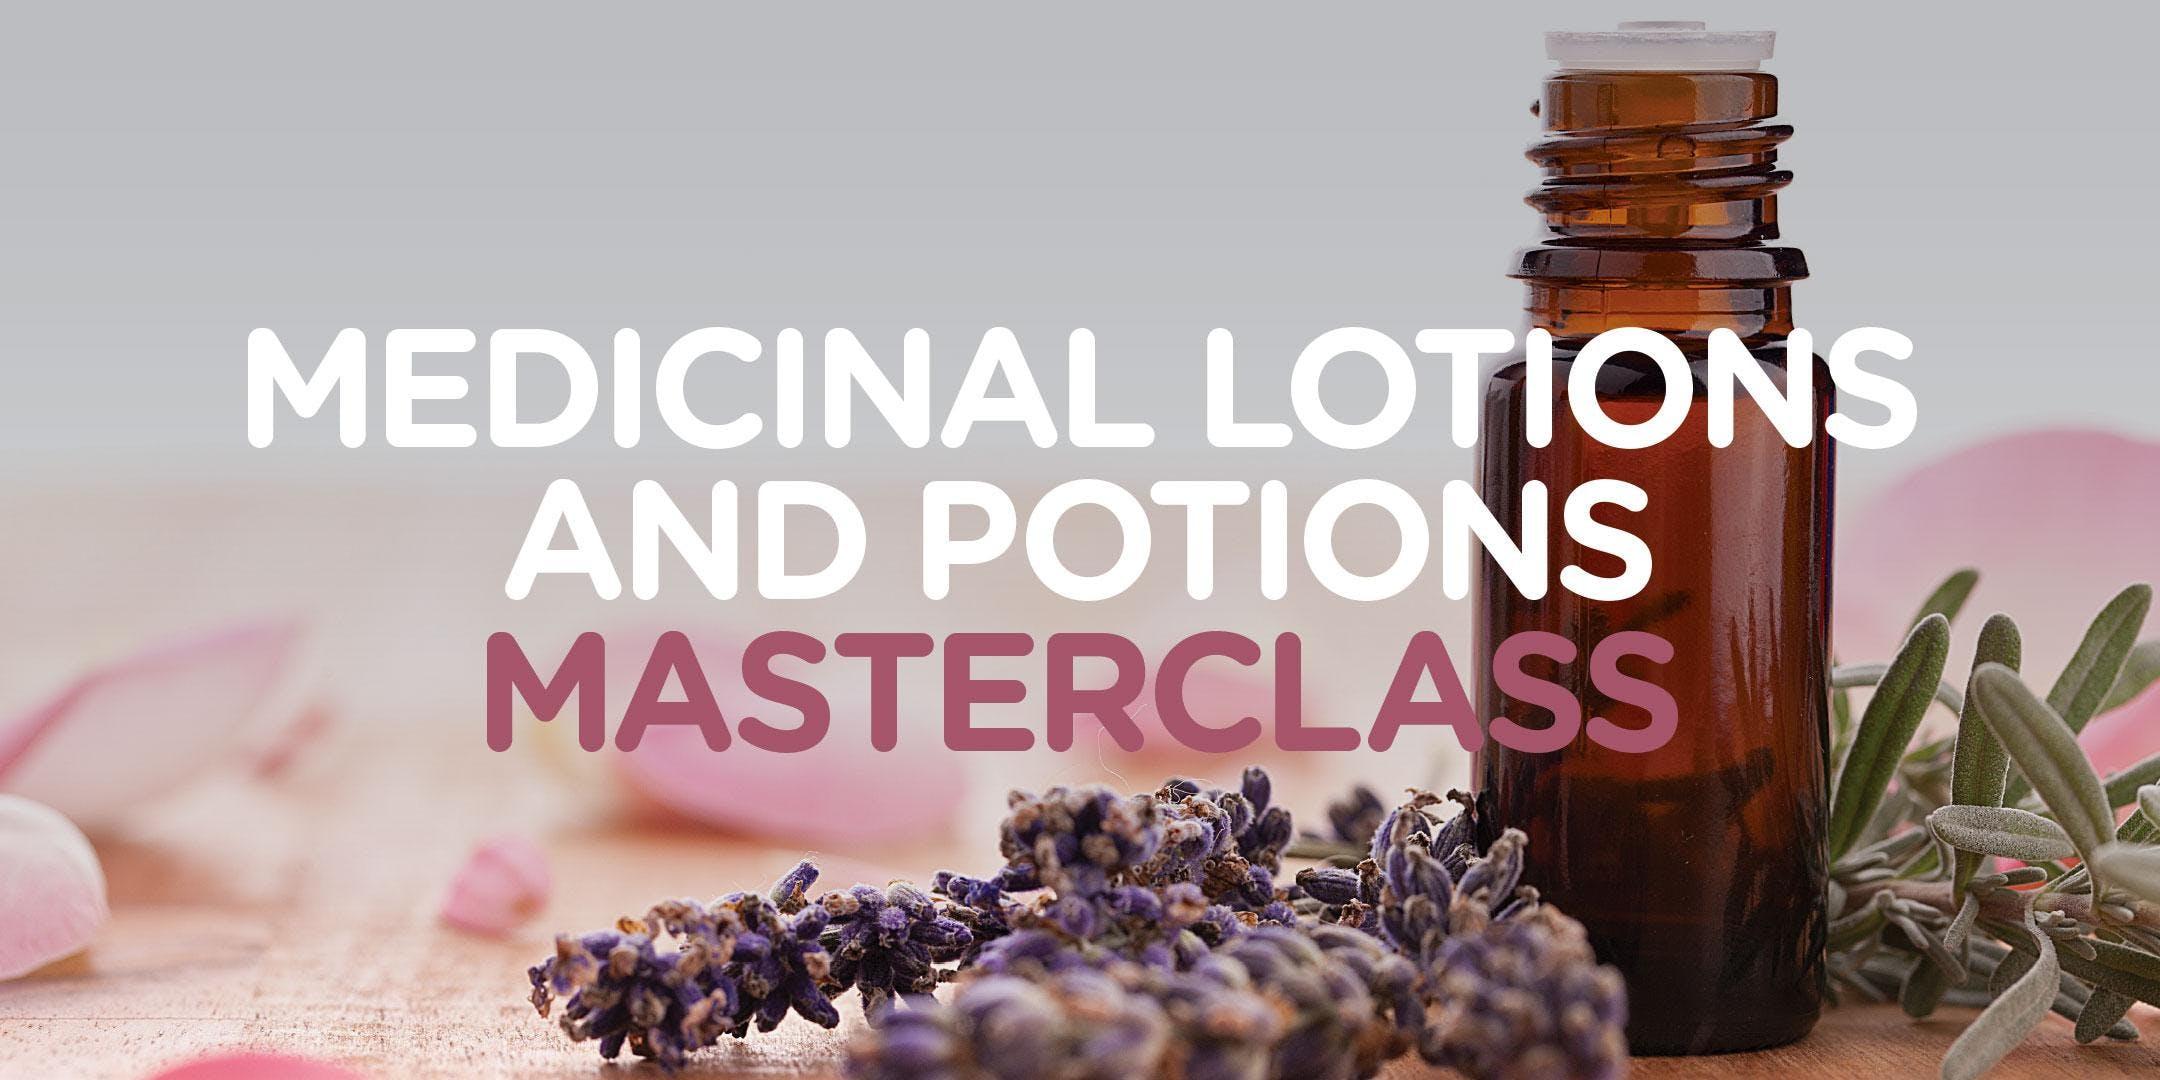 Medicinal Lotions &amp Potions - Adelaide Campus